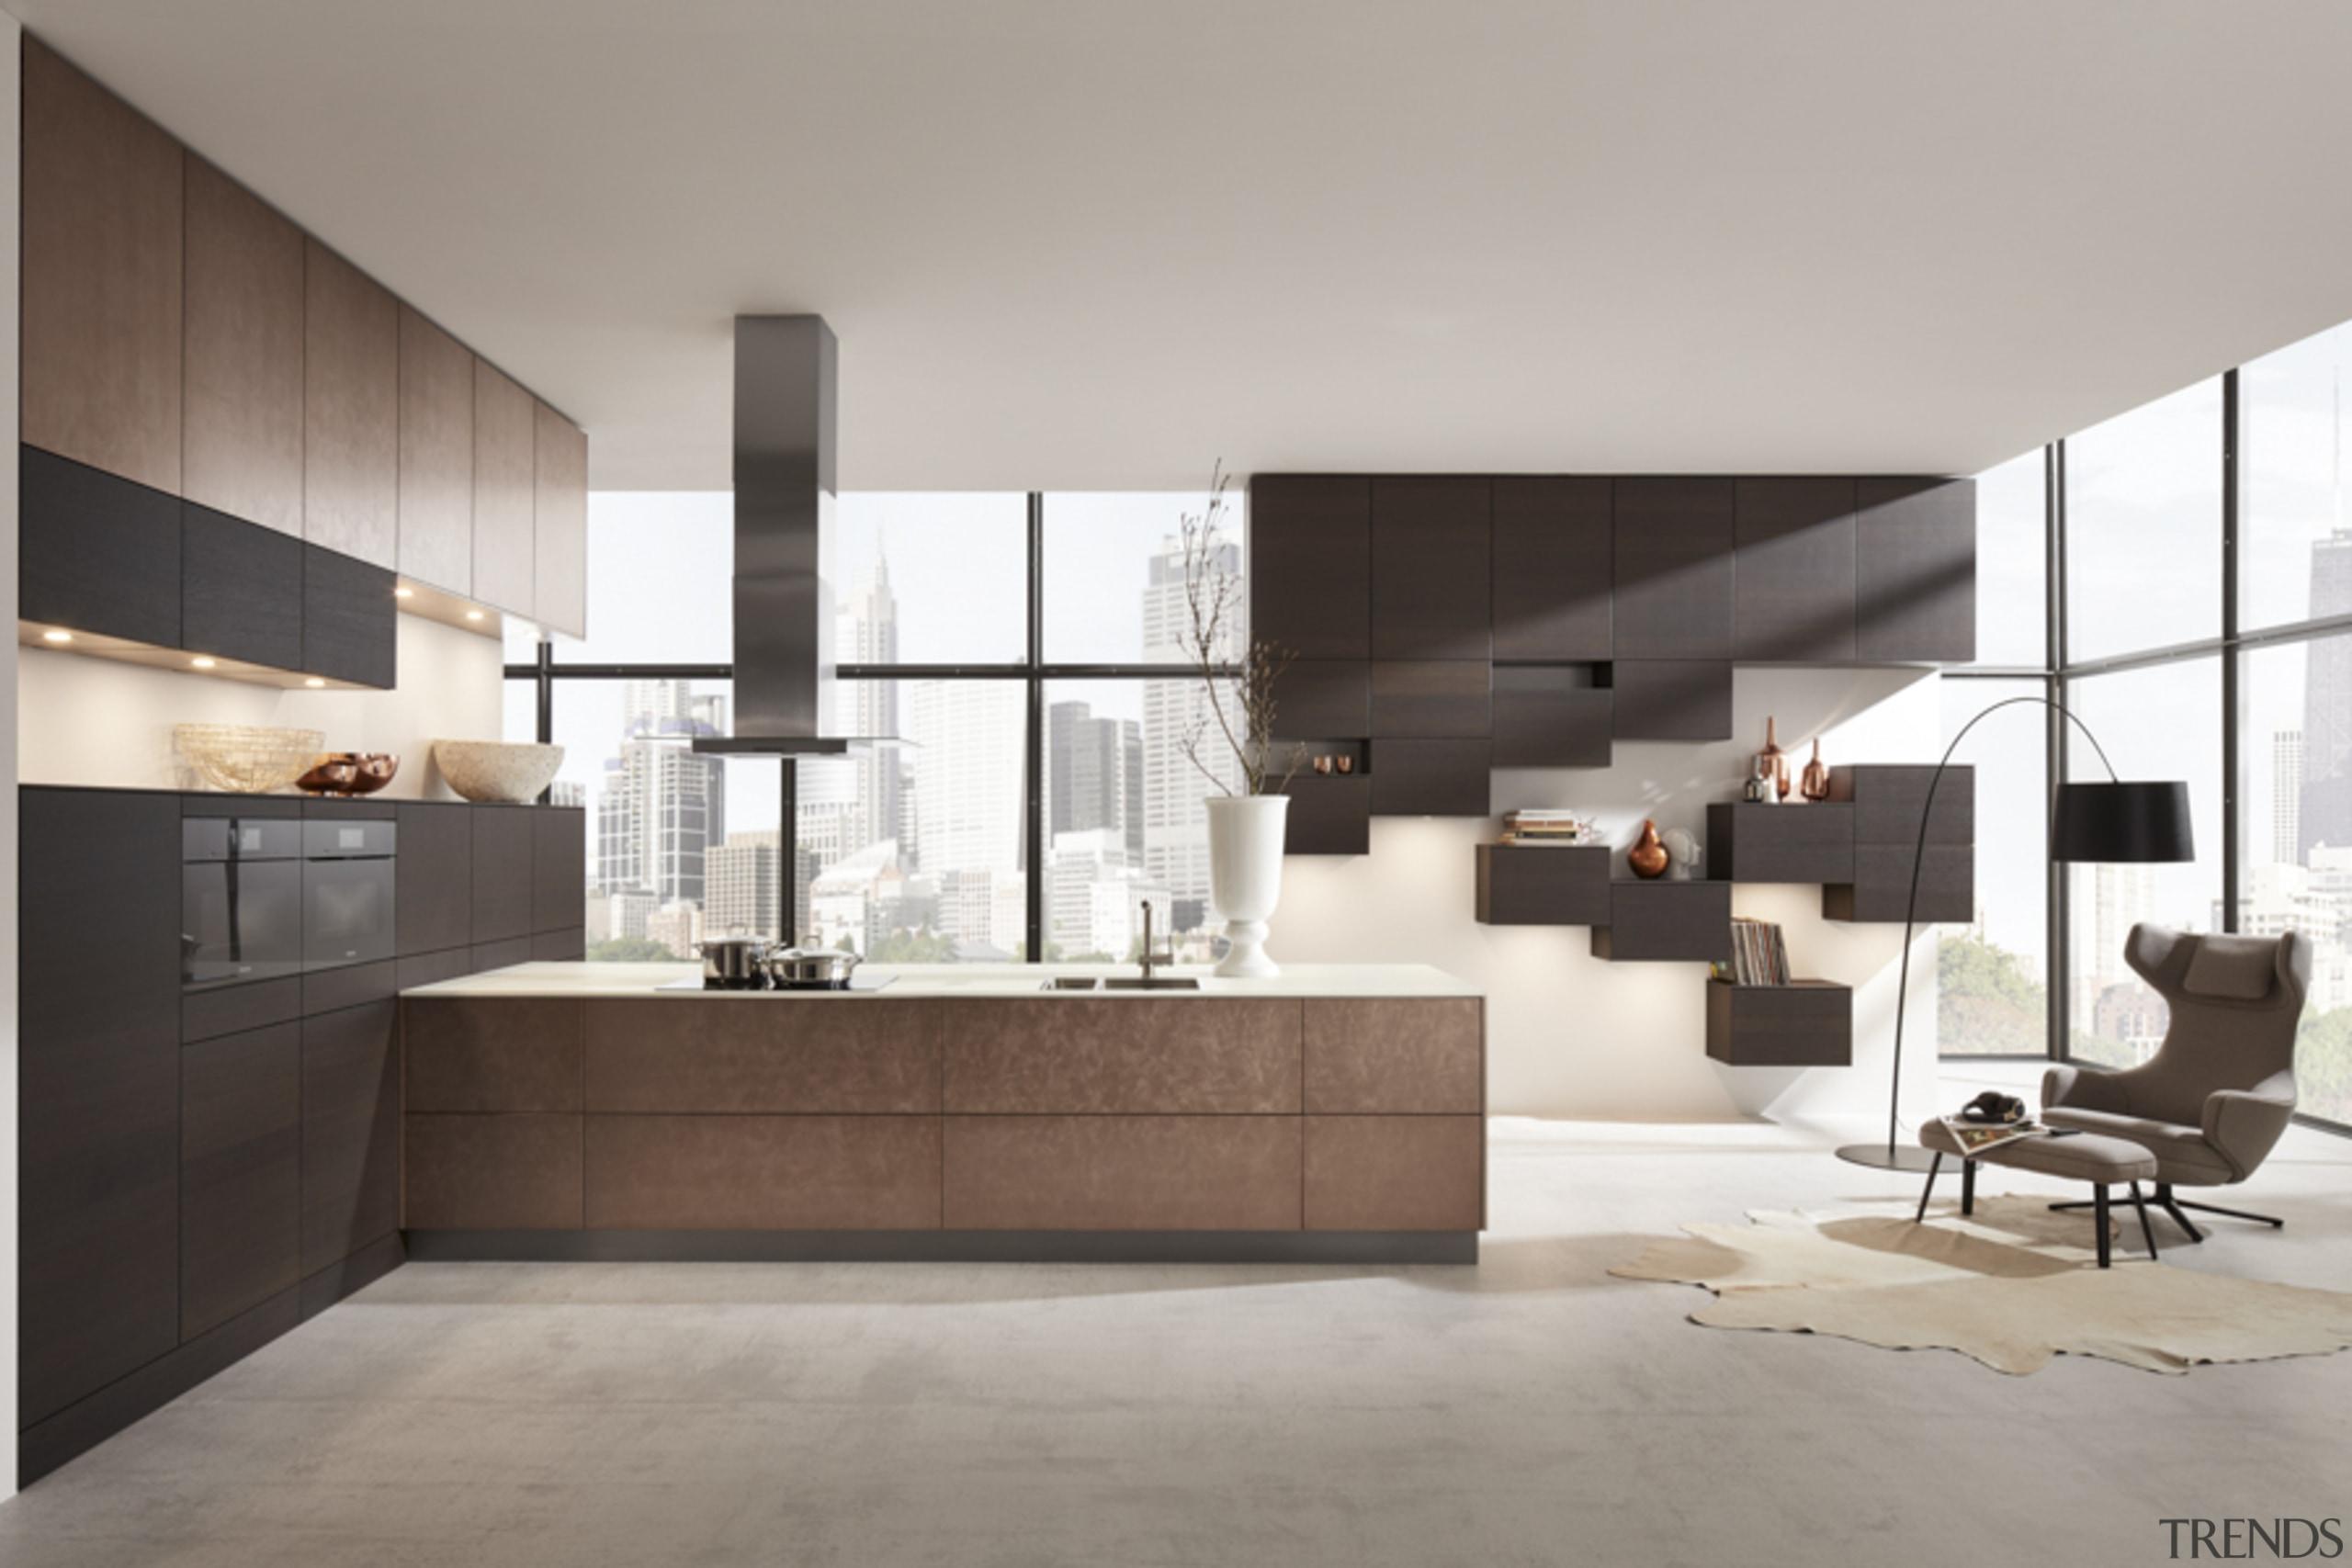 Neutral Hacker kitchen with unique floating storage architecture, floor, furniture, interior design, kitchen, living room, gray